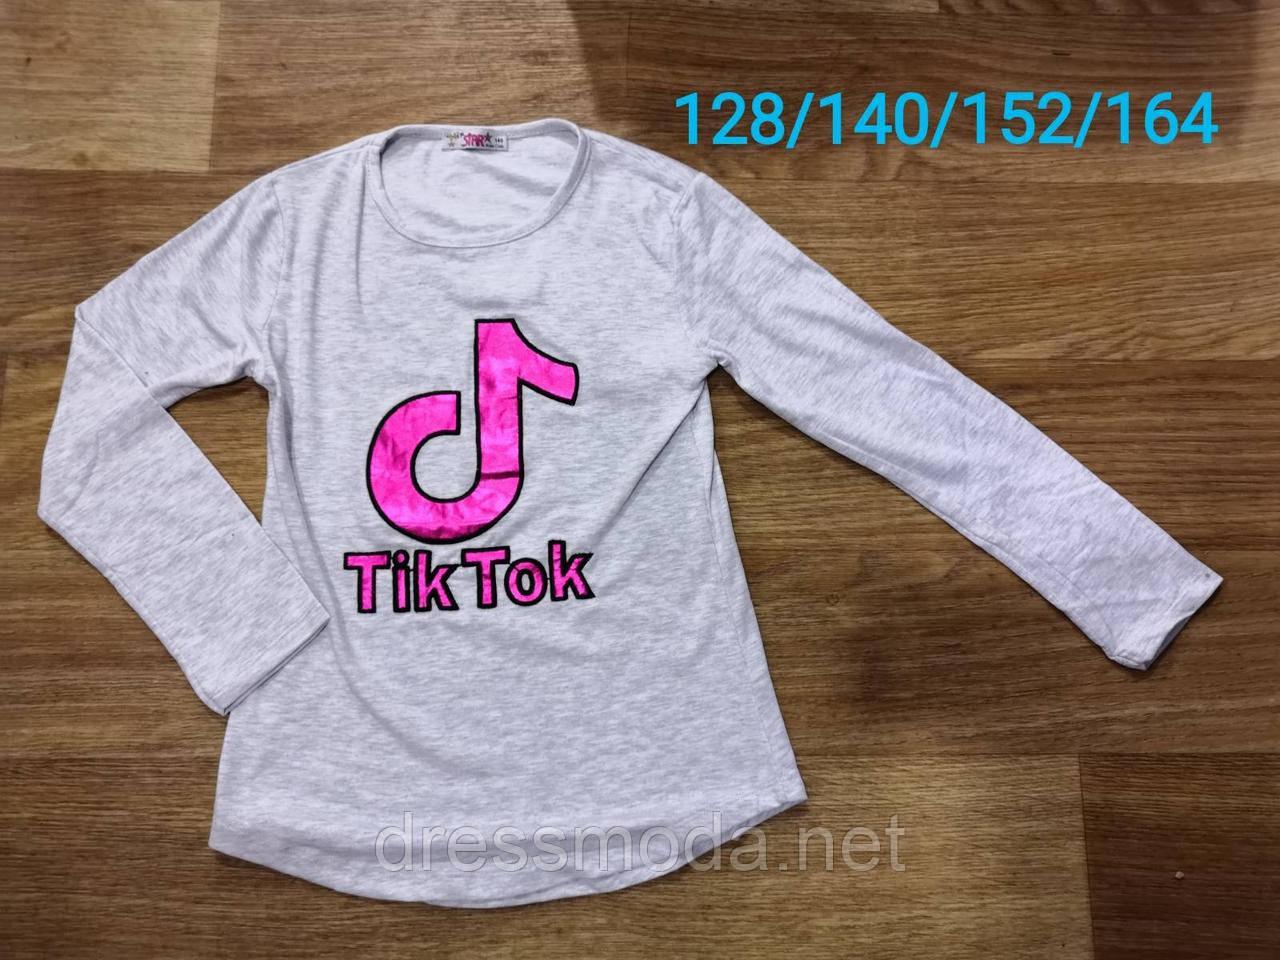 Регланы для девочек TIKTOK-B Турция 128-164 р.р.